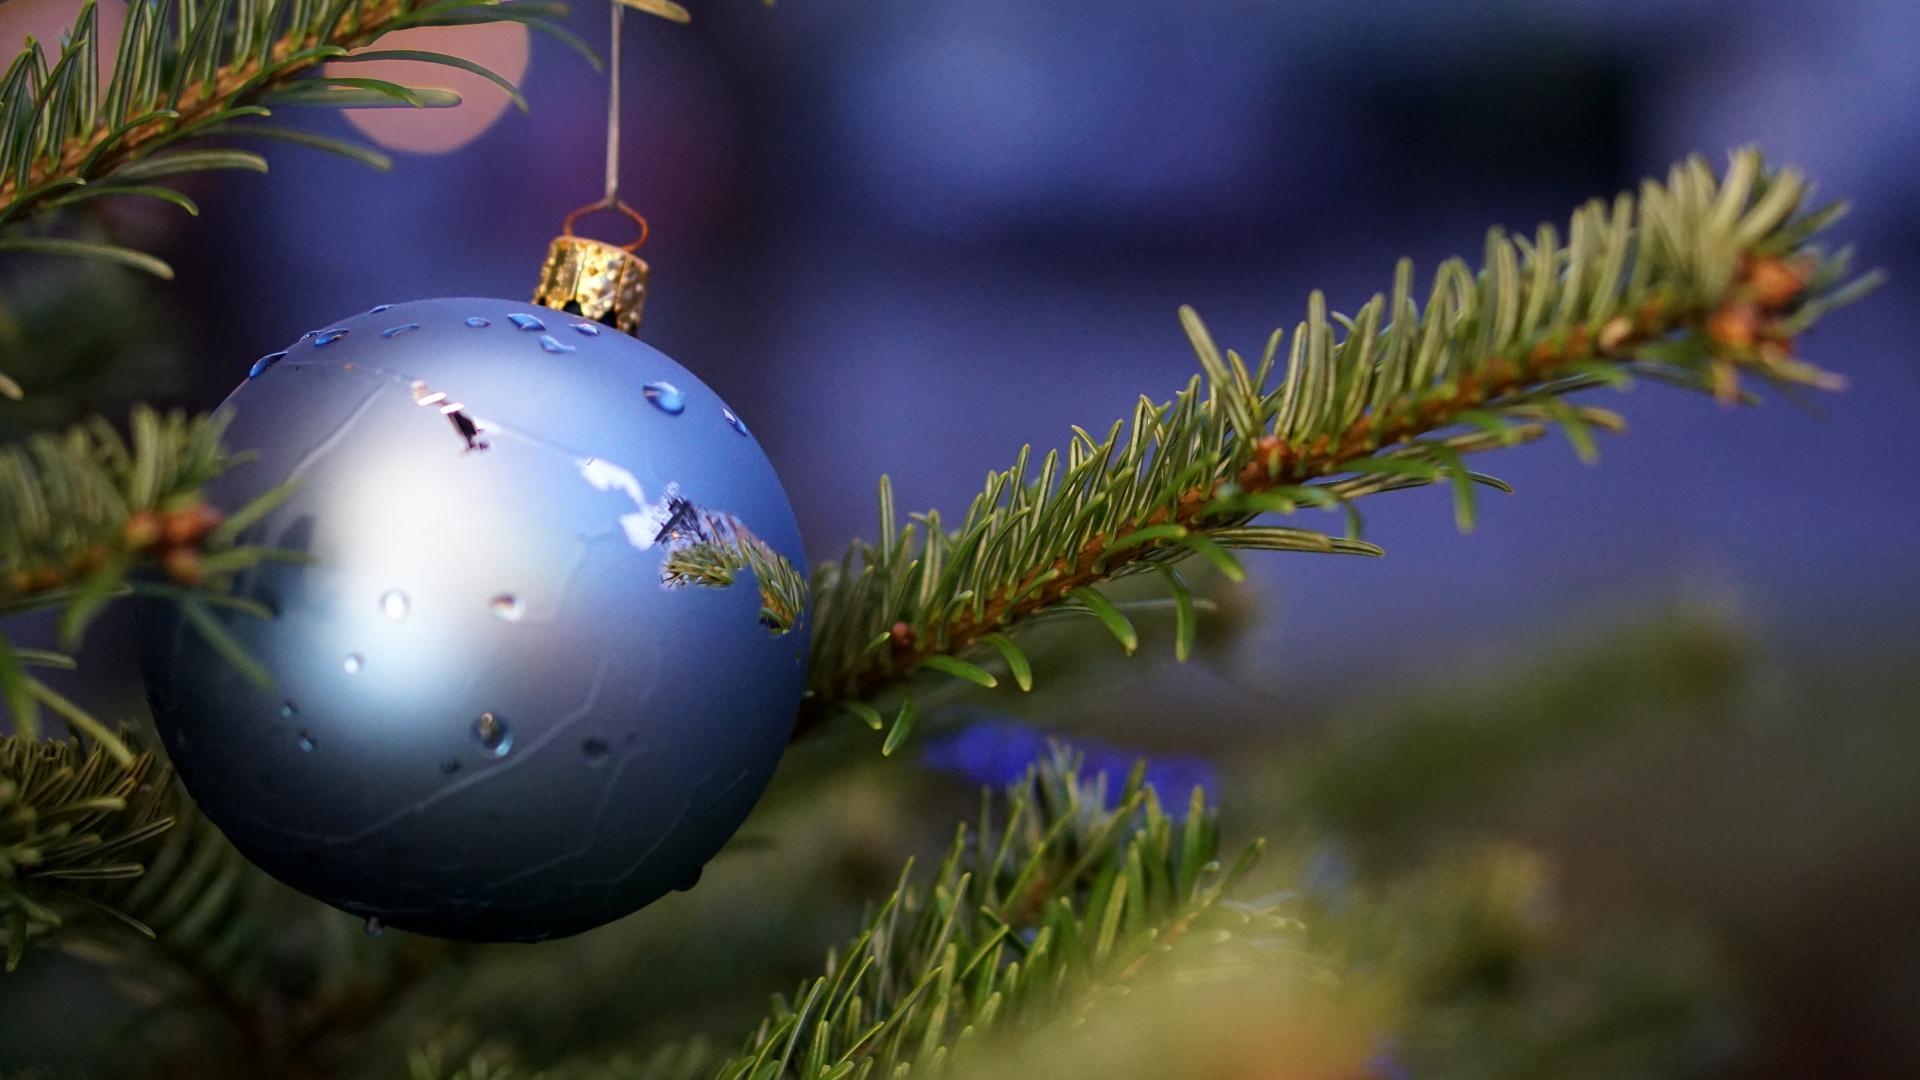 Kugel am Christbaum — Weihnachten 2017